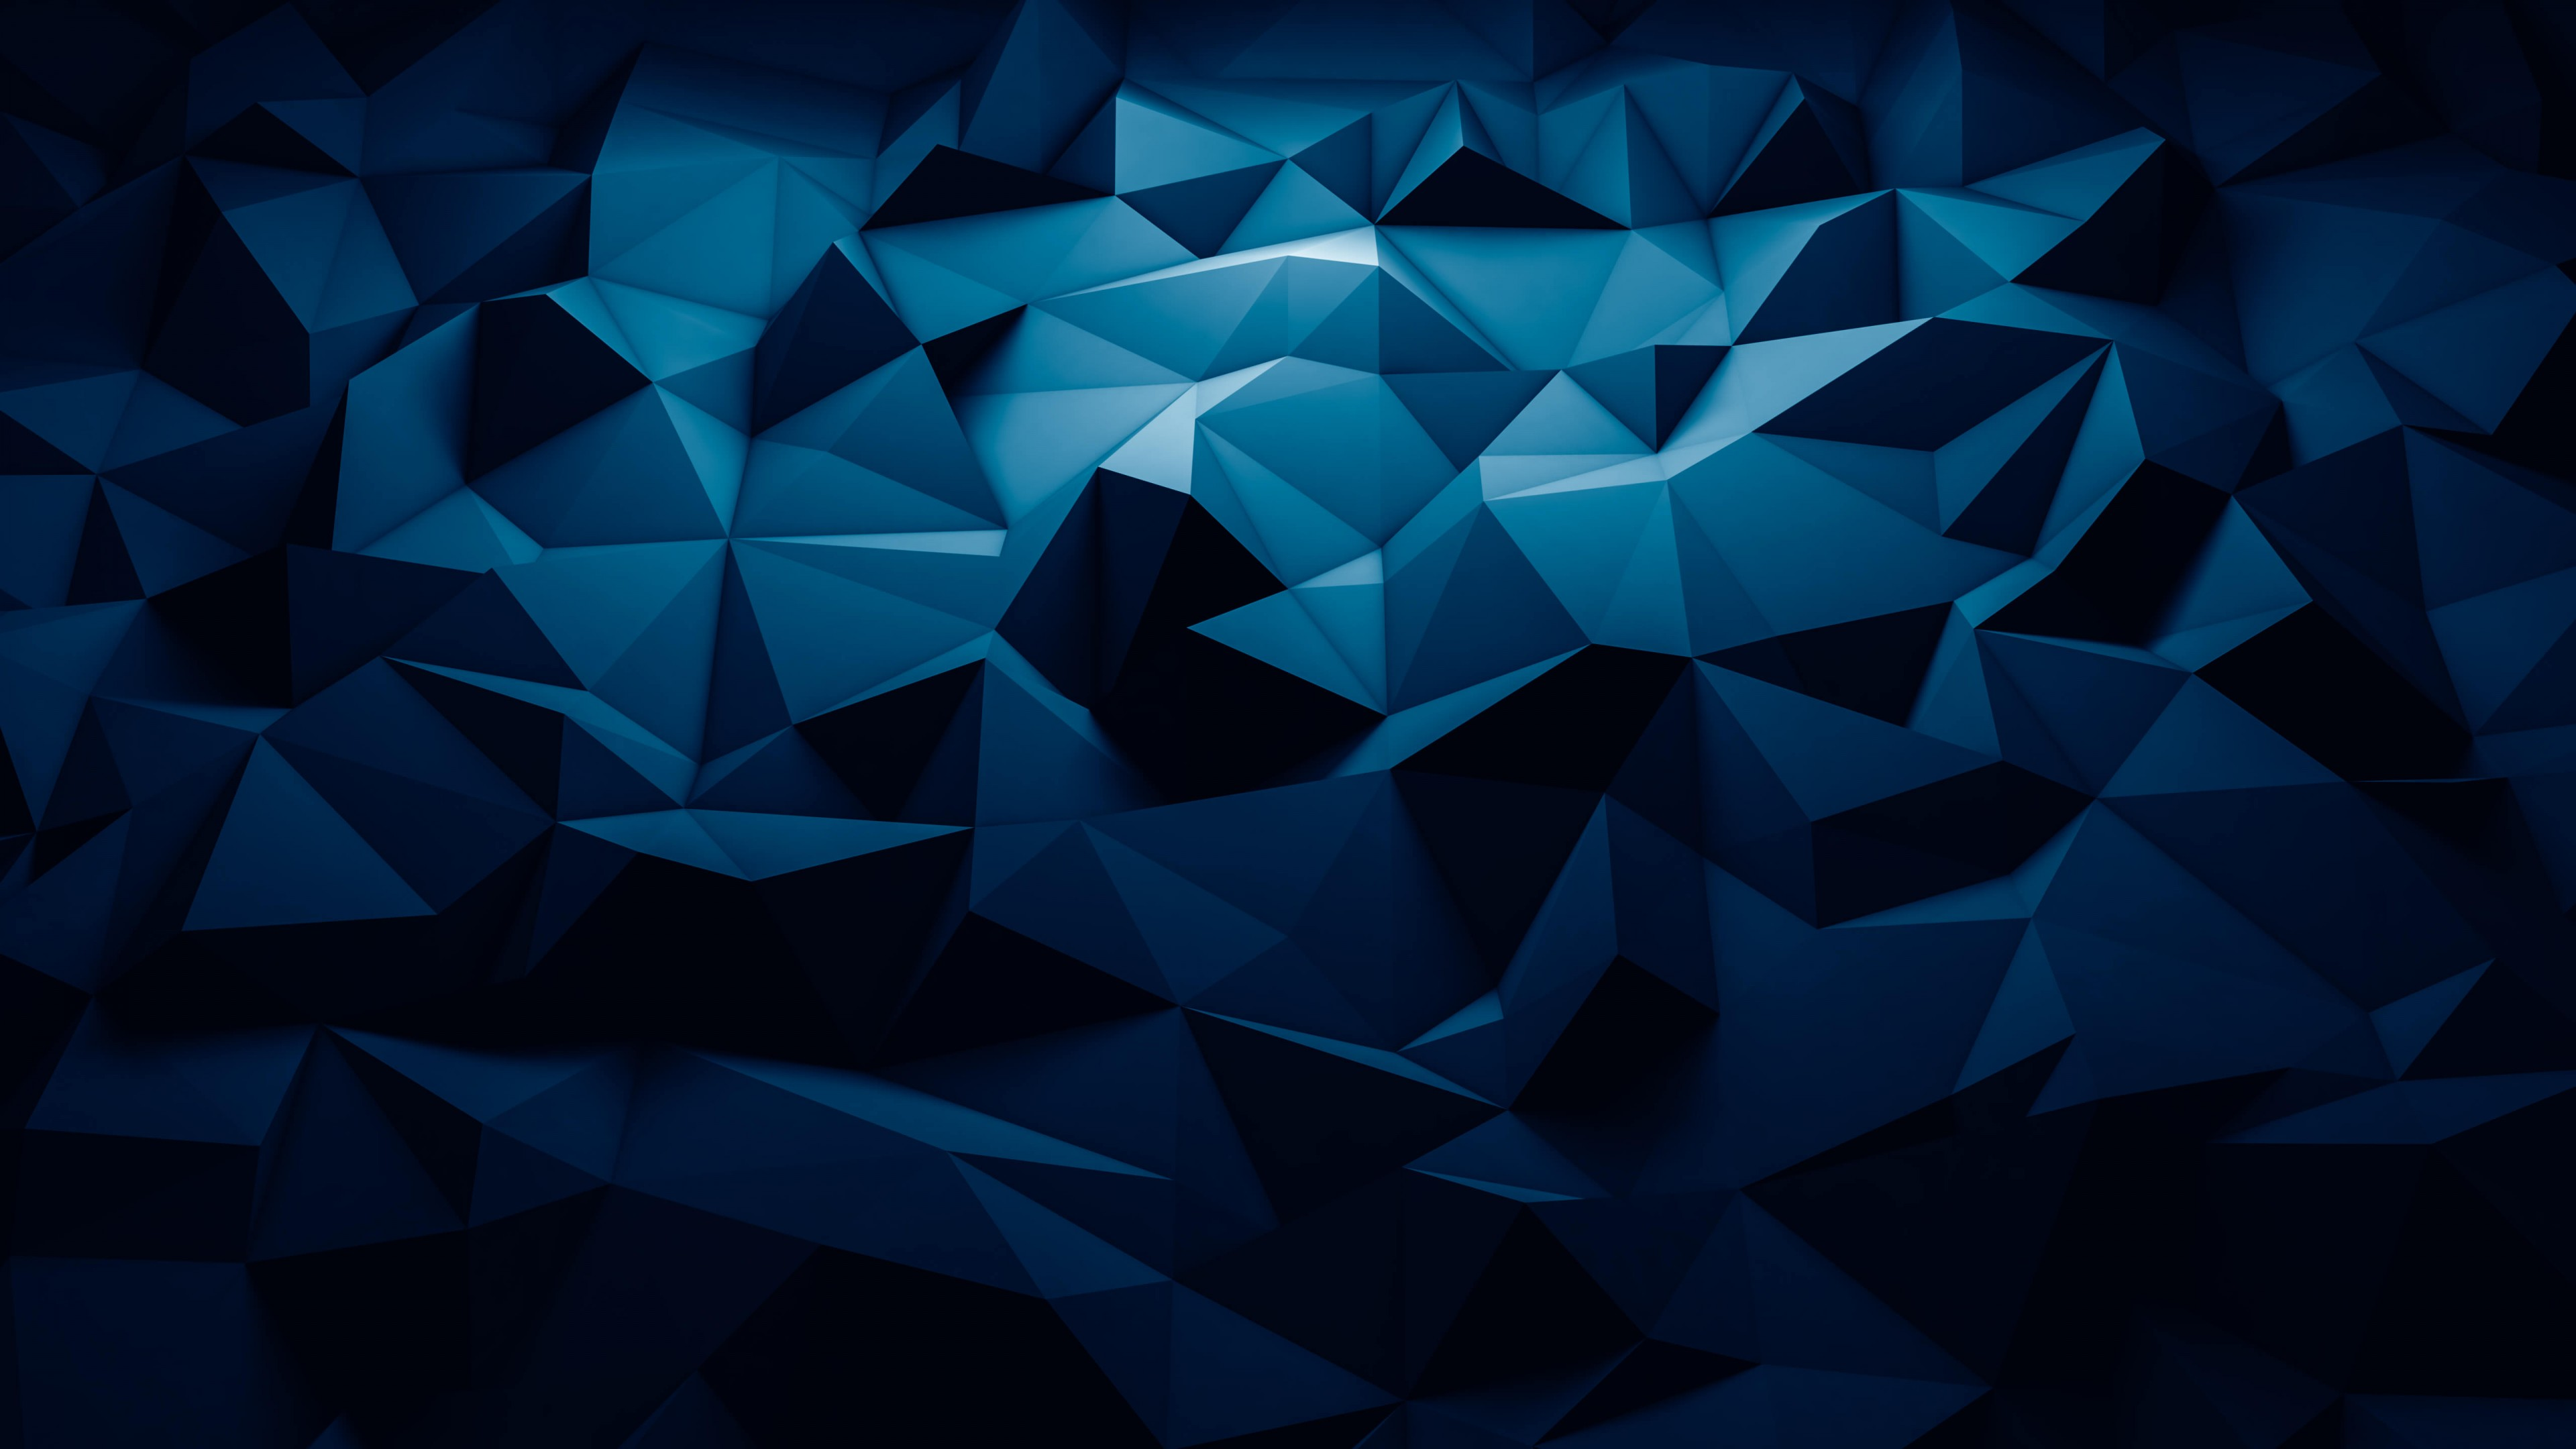 Alienware wallpaper 3840 x 2160 wallpapersafari for Fondo azul oscuro